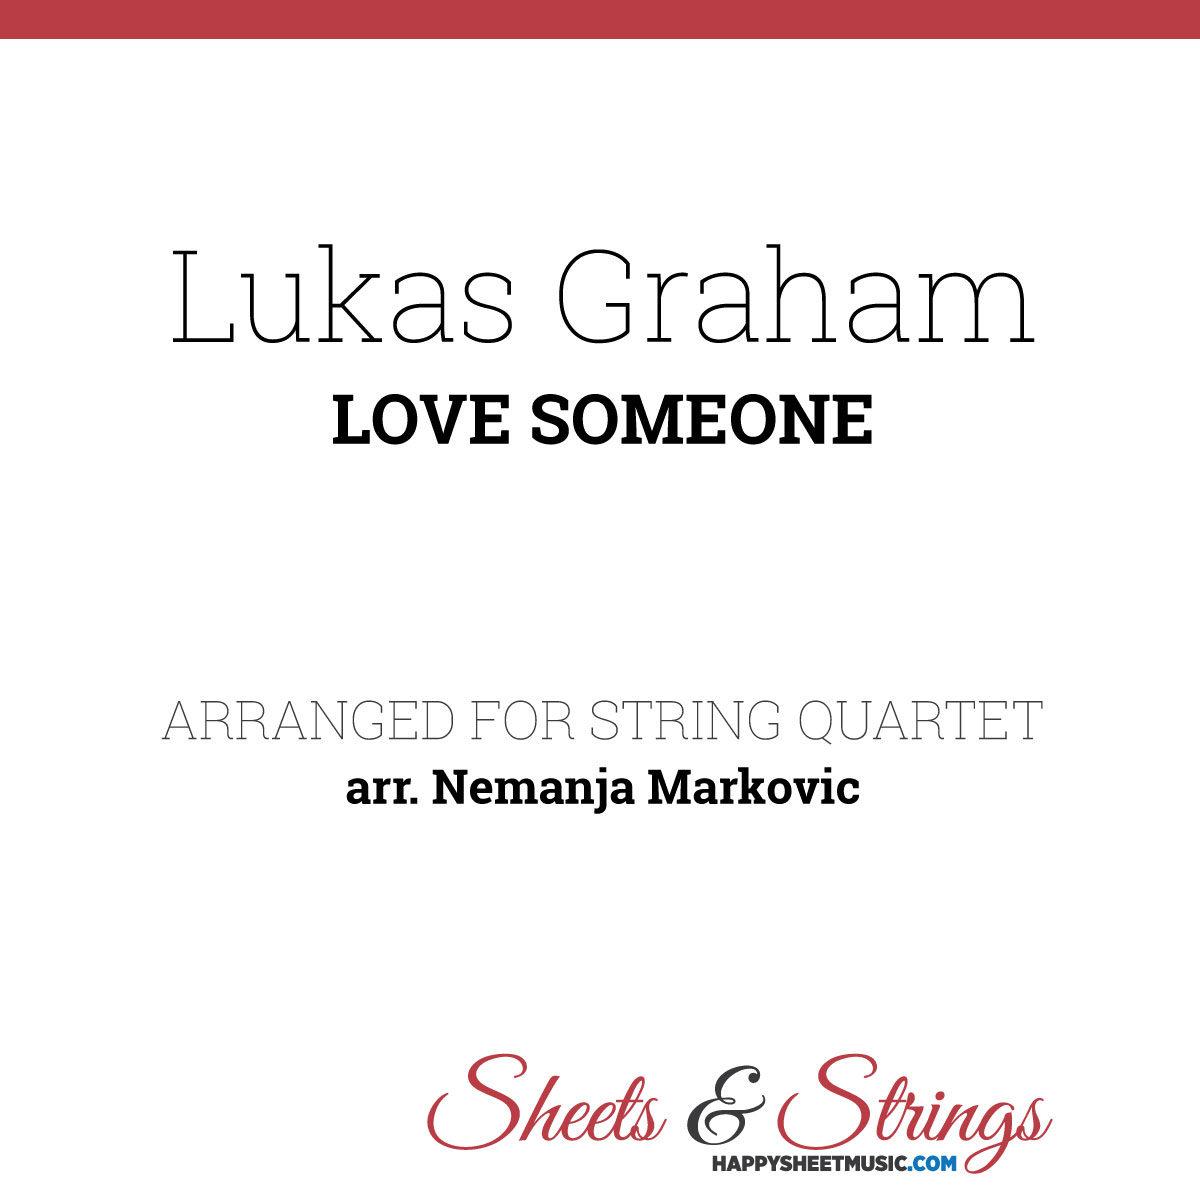 Lukas Graham - Love Someone - Sheet Music for String Quartet - Music Arrangement for String Quartet